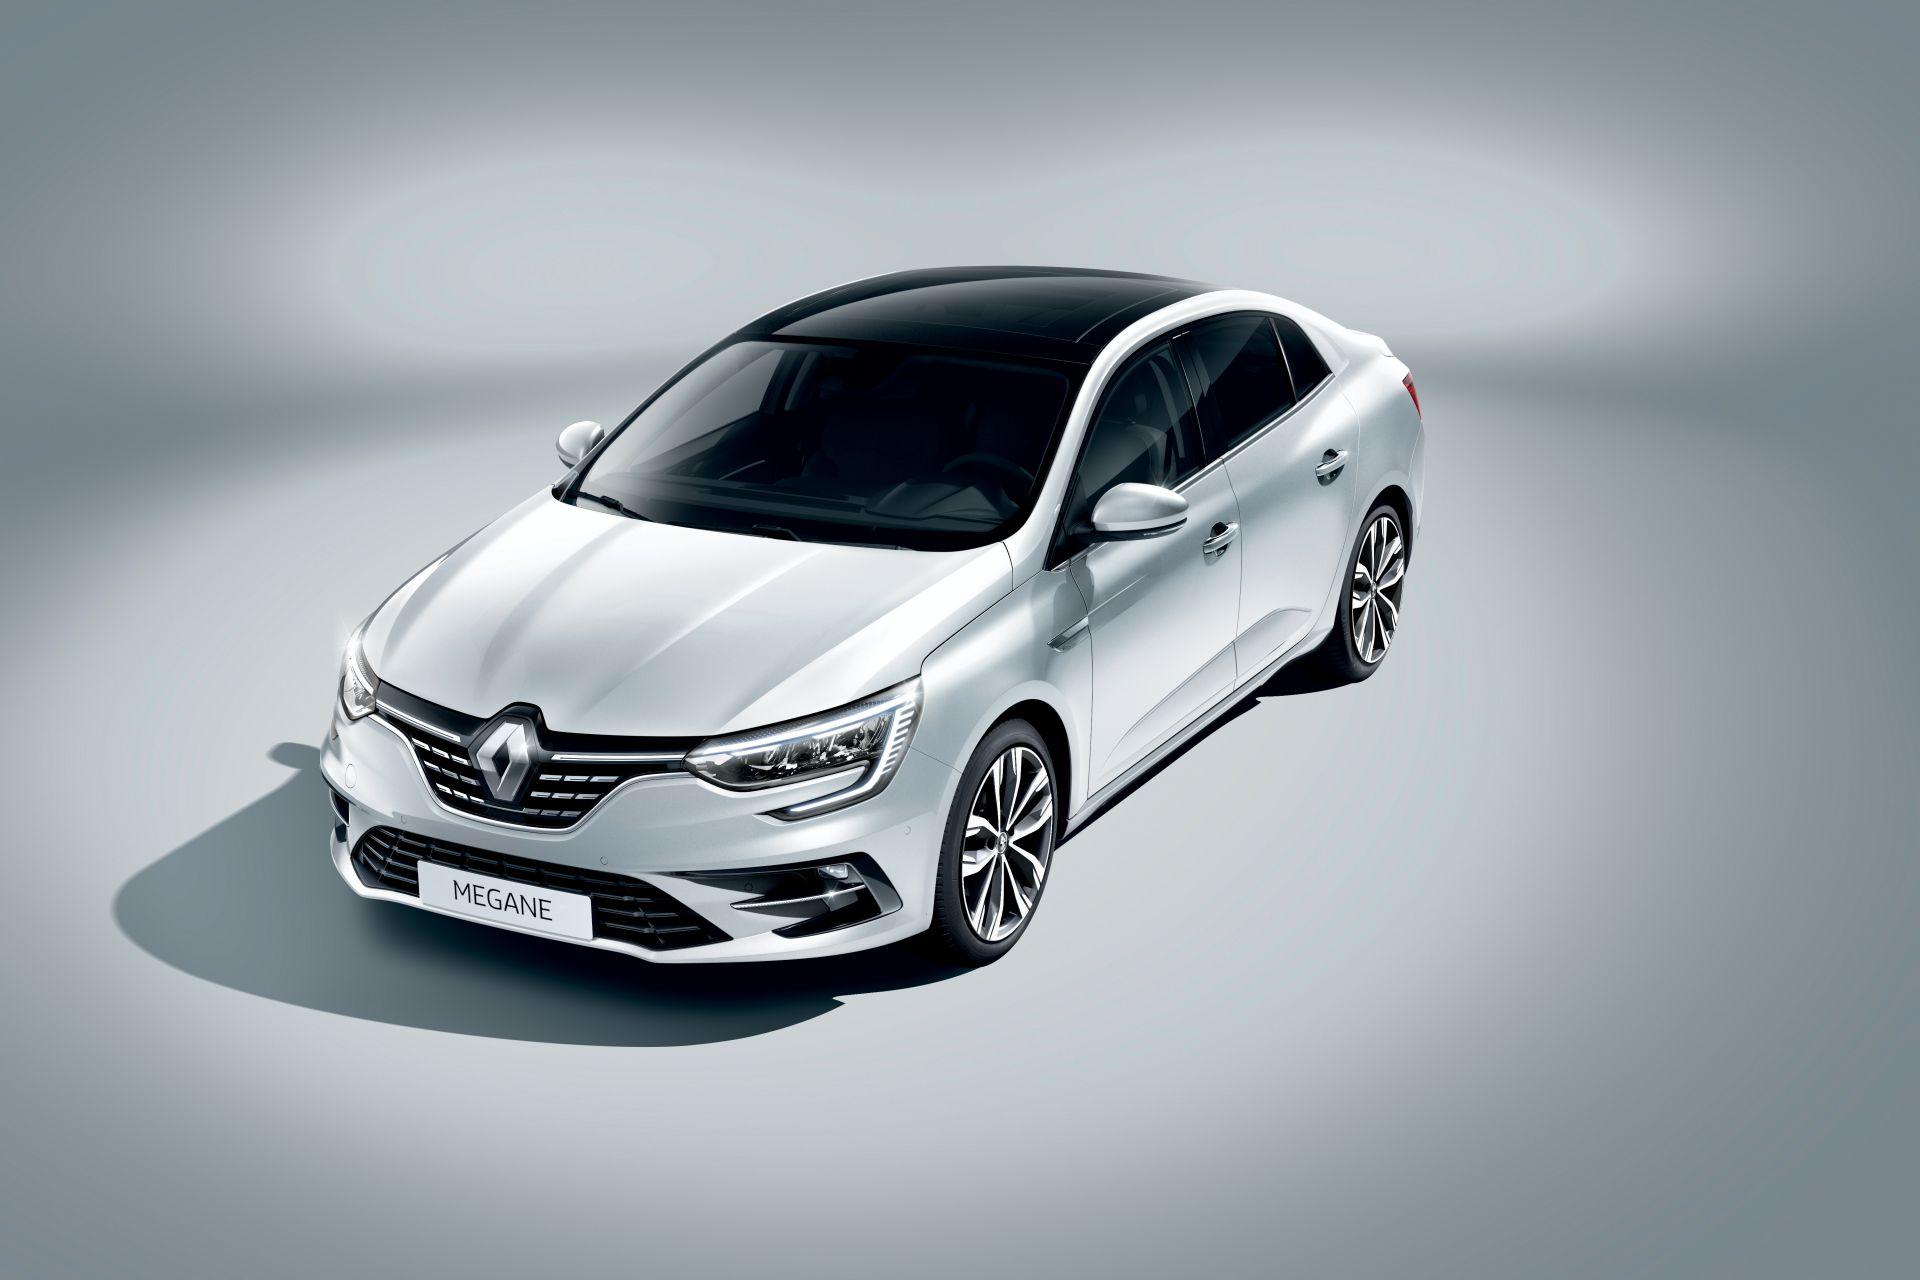 2021-Renault-Megane-Sedan-facelift-17